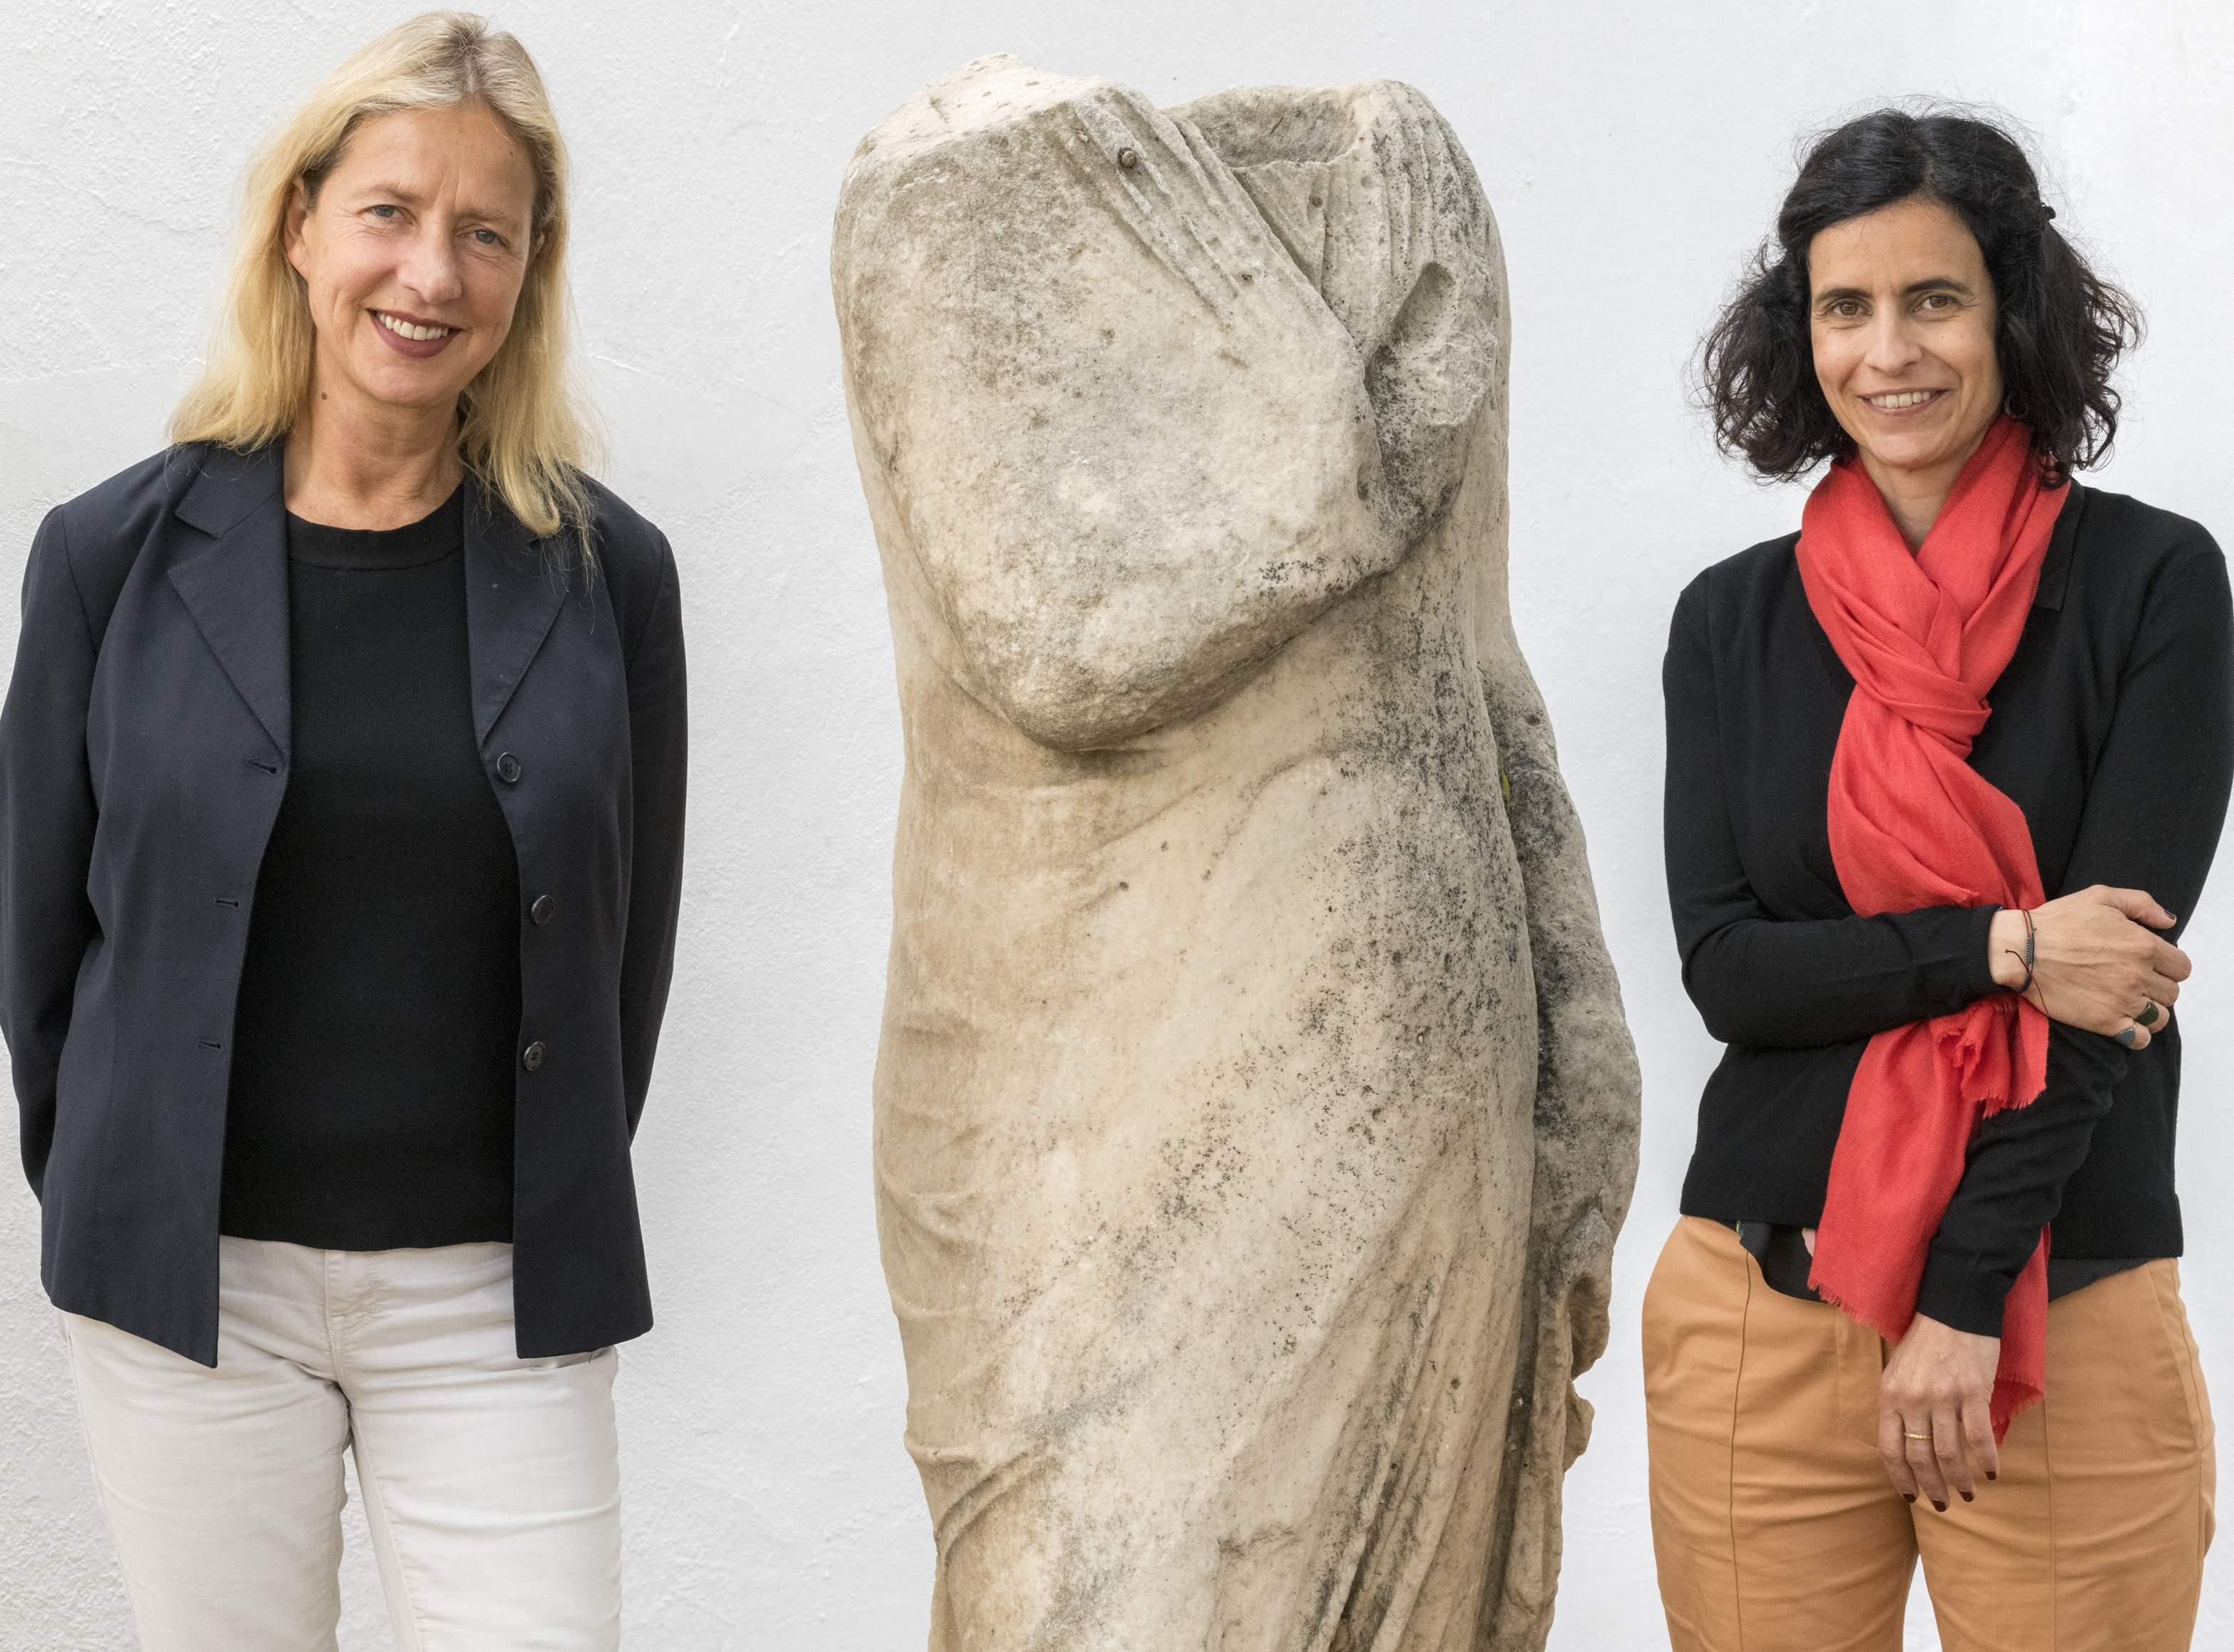 Iwona Blazwick, OBE, Διευθύντρια Whitechapel Gallery και Ελίνα Κουντούρη, Διευθύντρια ΝΕΟΝ. Φωτογραφία © Πάνος Κοκκινιάς